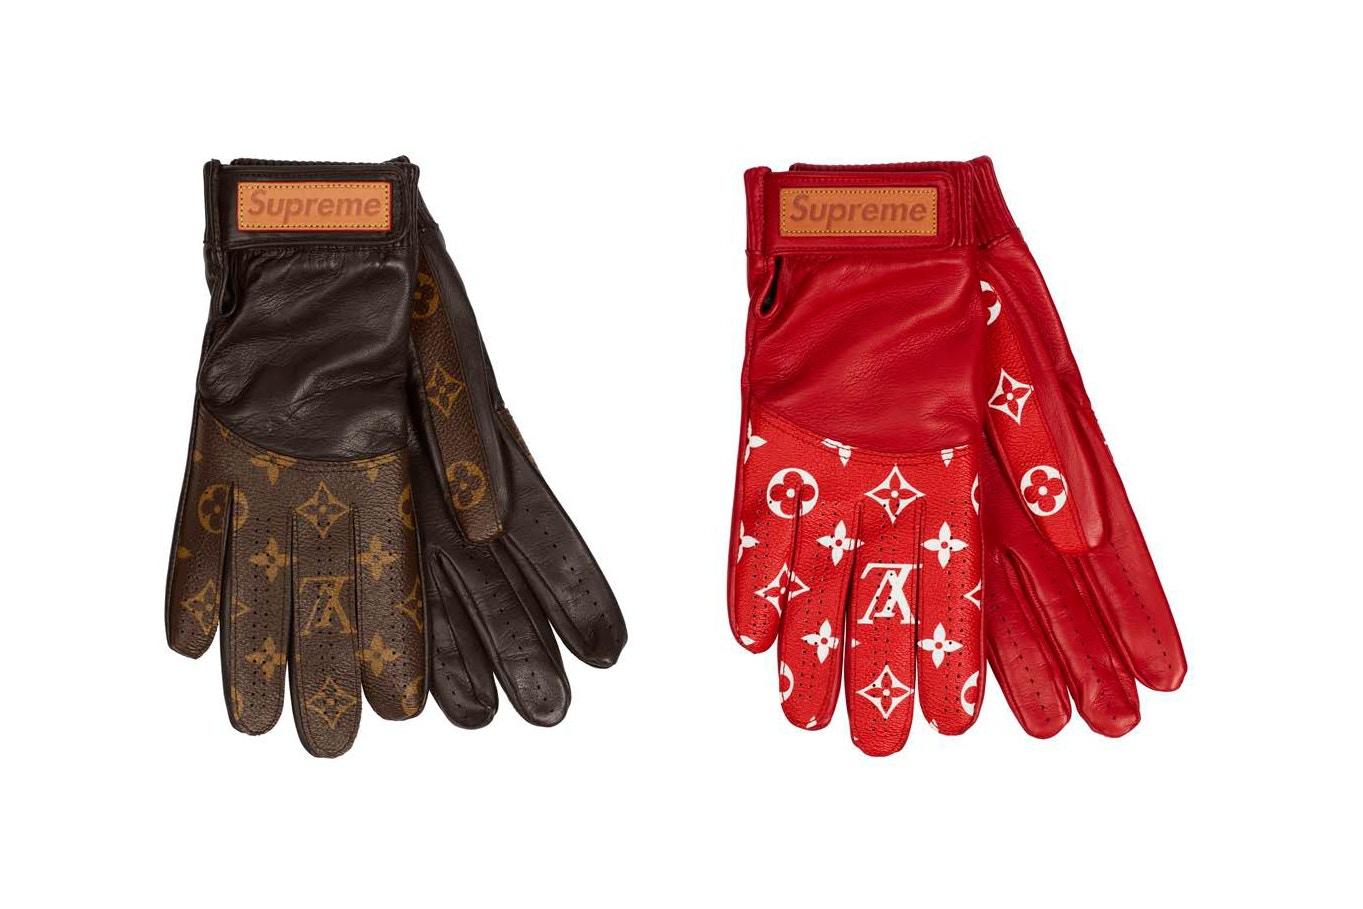 Supreme(シュプリーム)×Louis Vuitton(ルイ・ヴィトン) / ベースボール グローブ(Baseball Gloves)